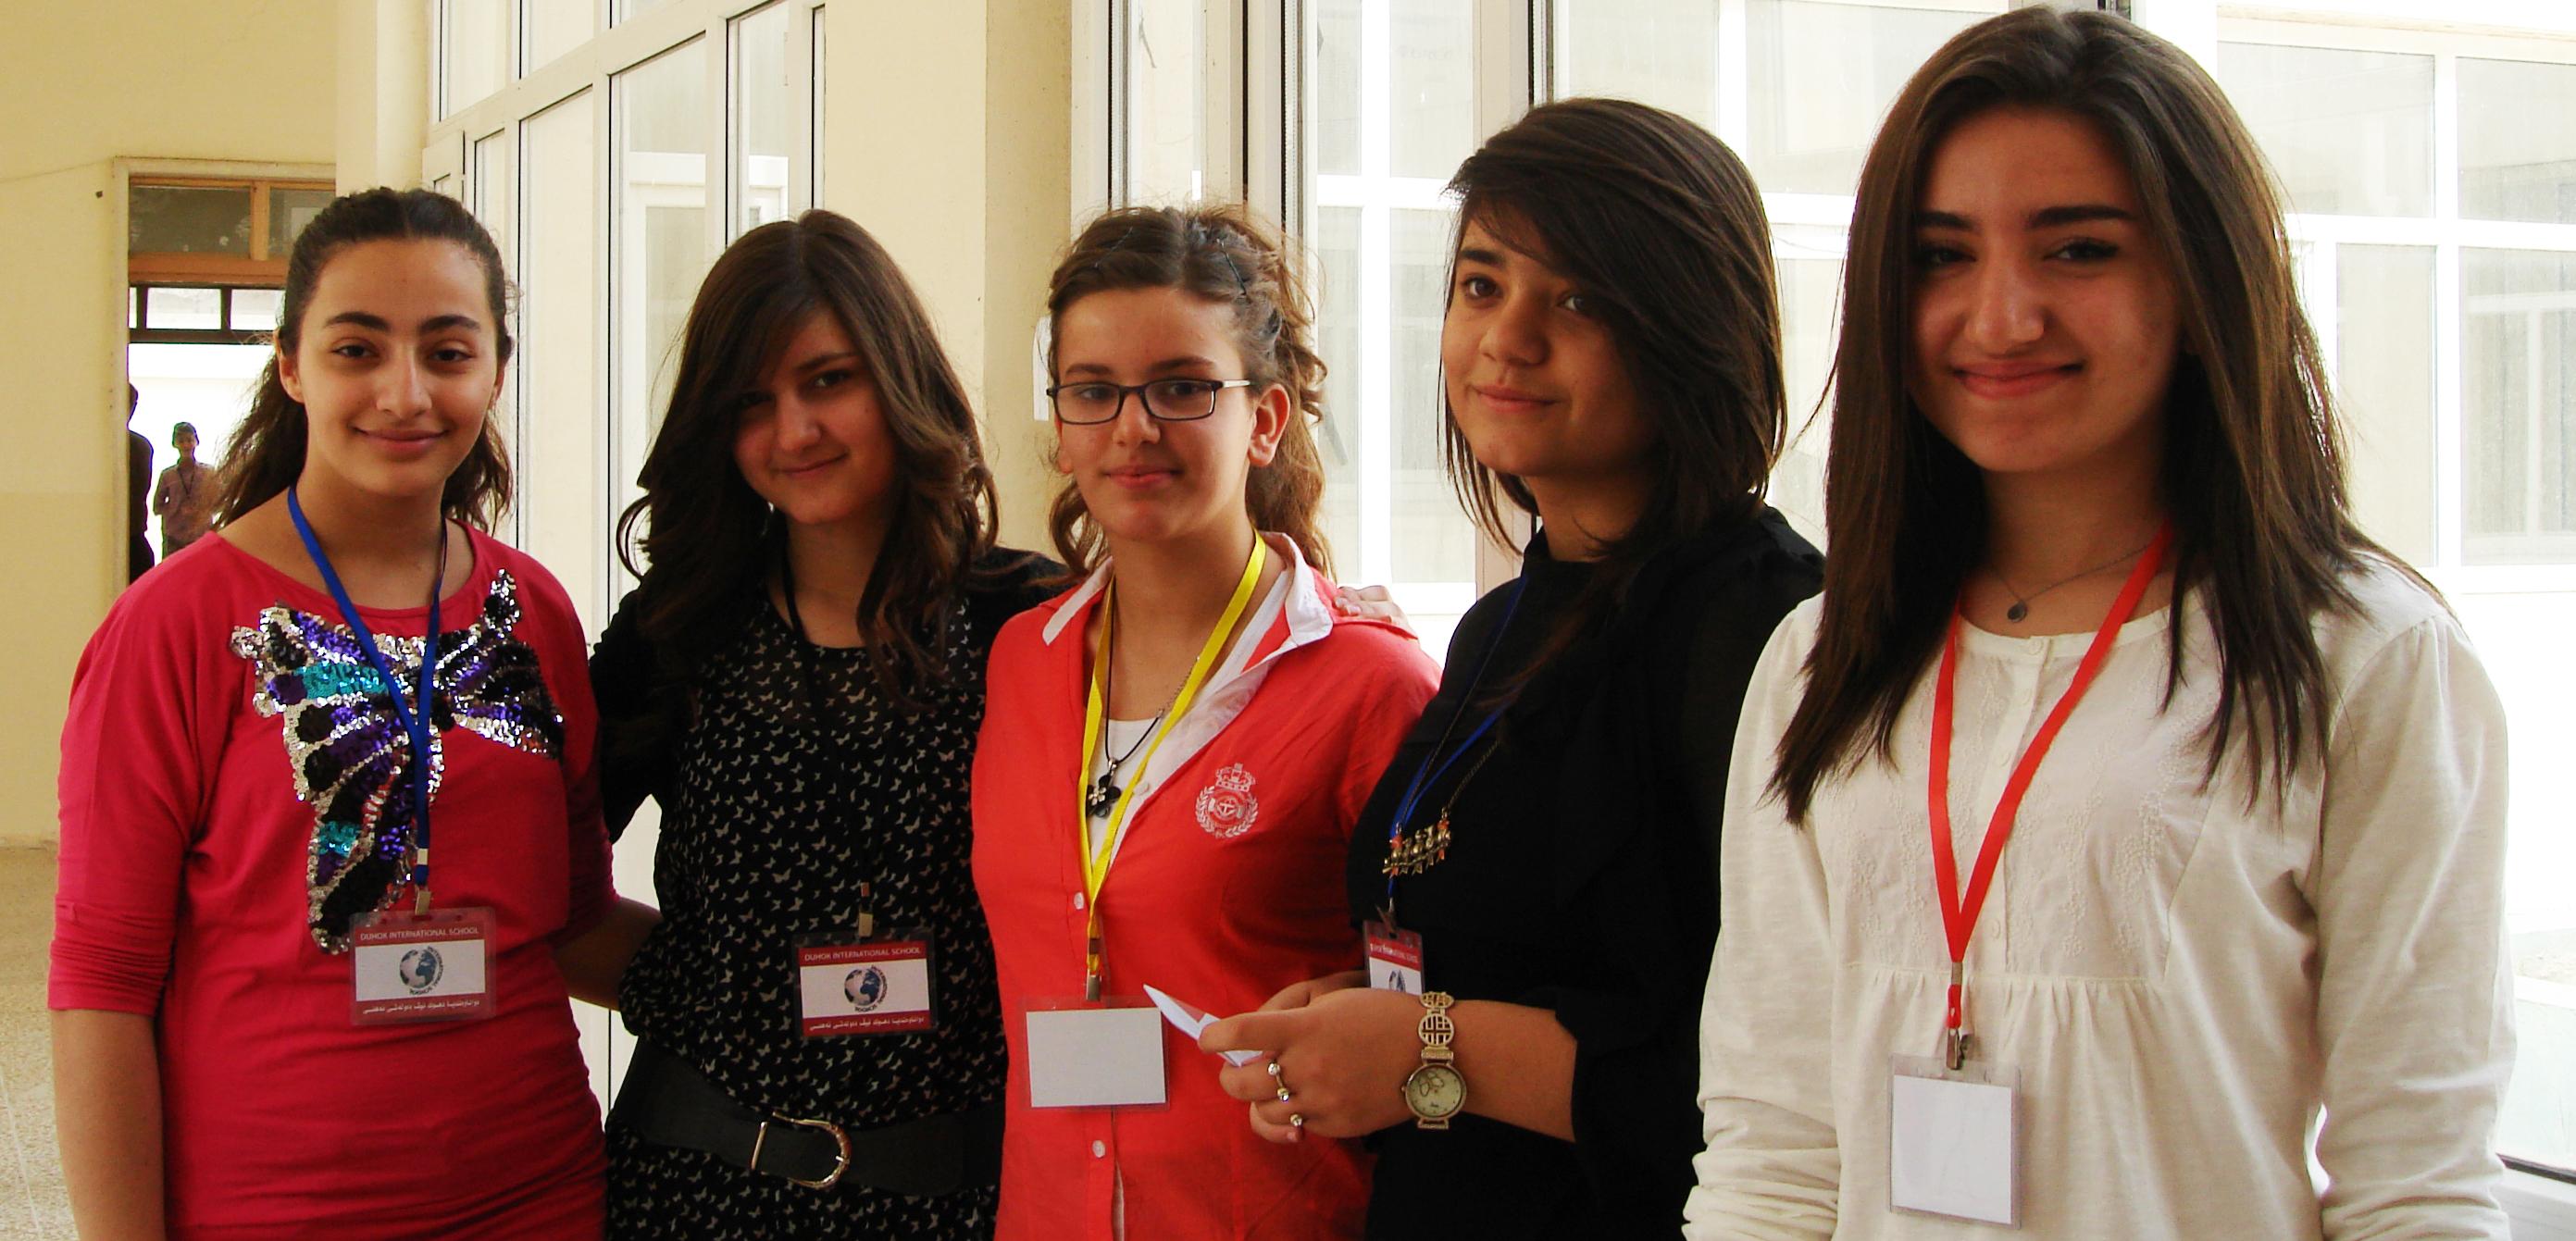 Jeunes étudiantes rangées